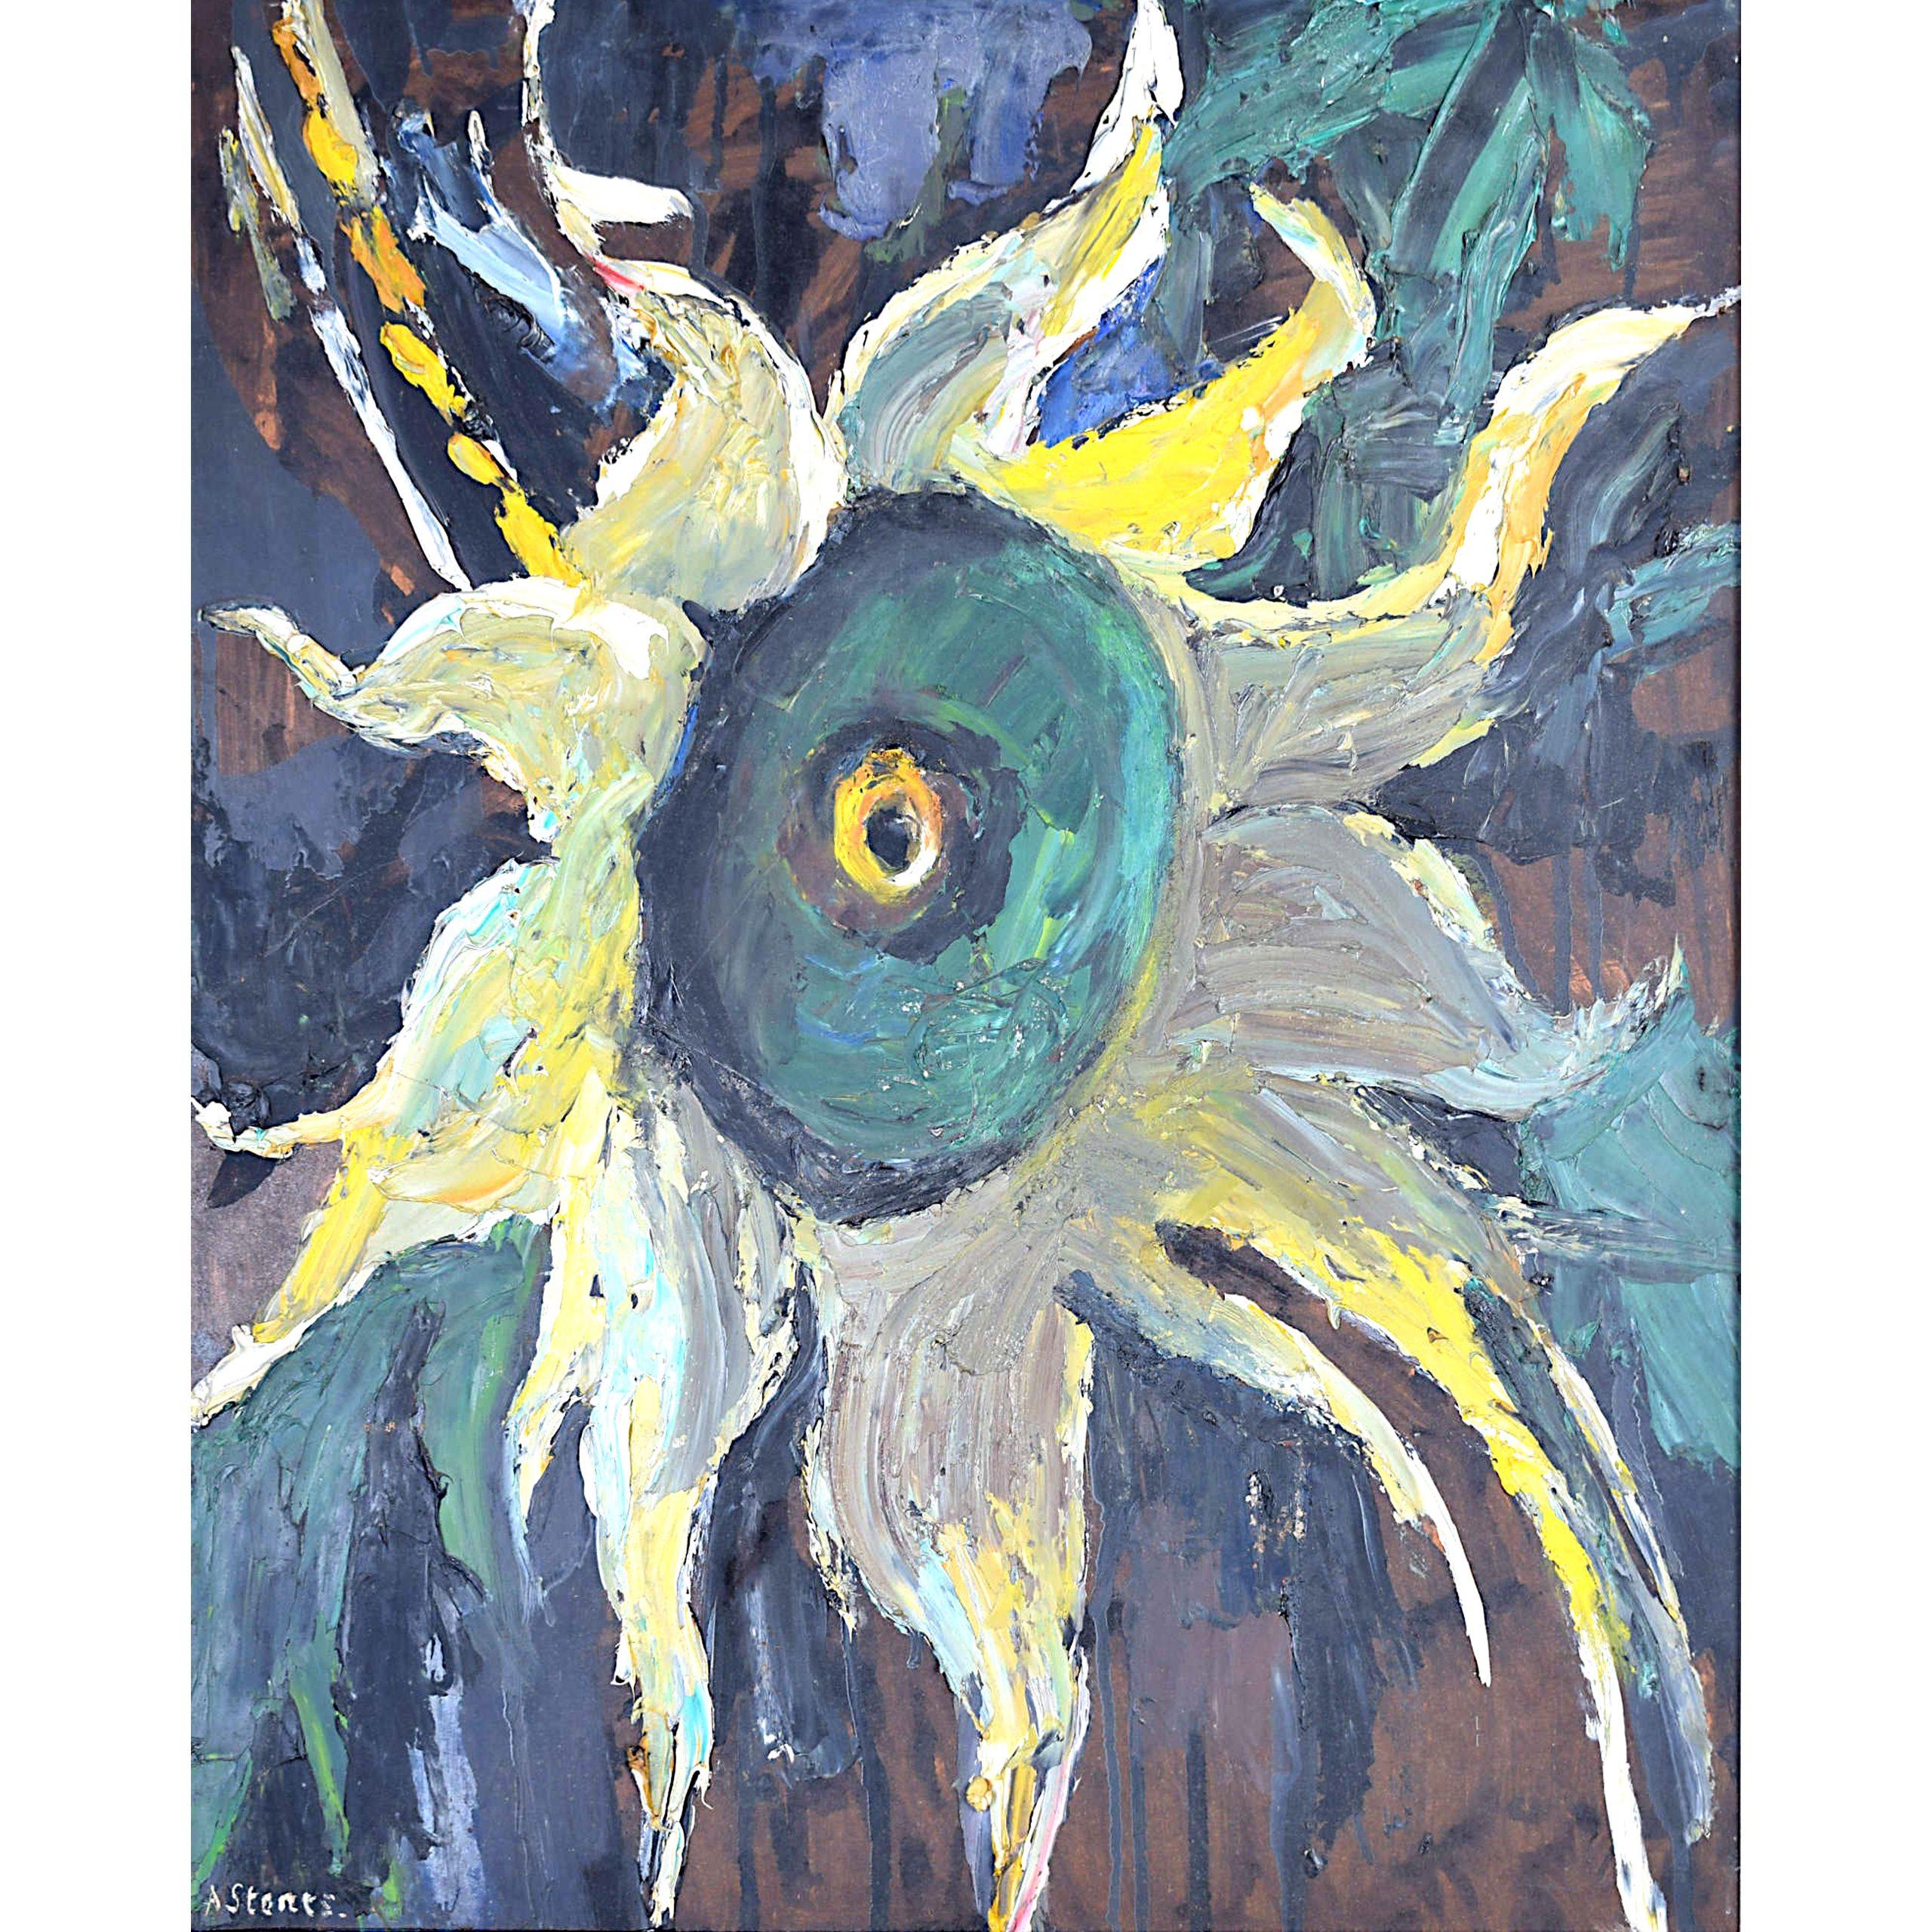 Angela Stones Helianthus Oil Painting Mid Century Modern British Art Surreal